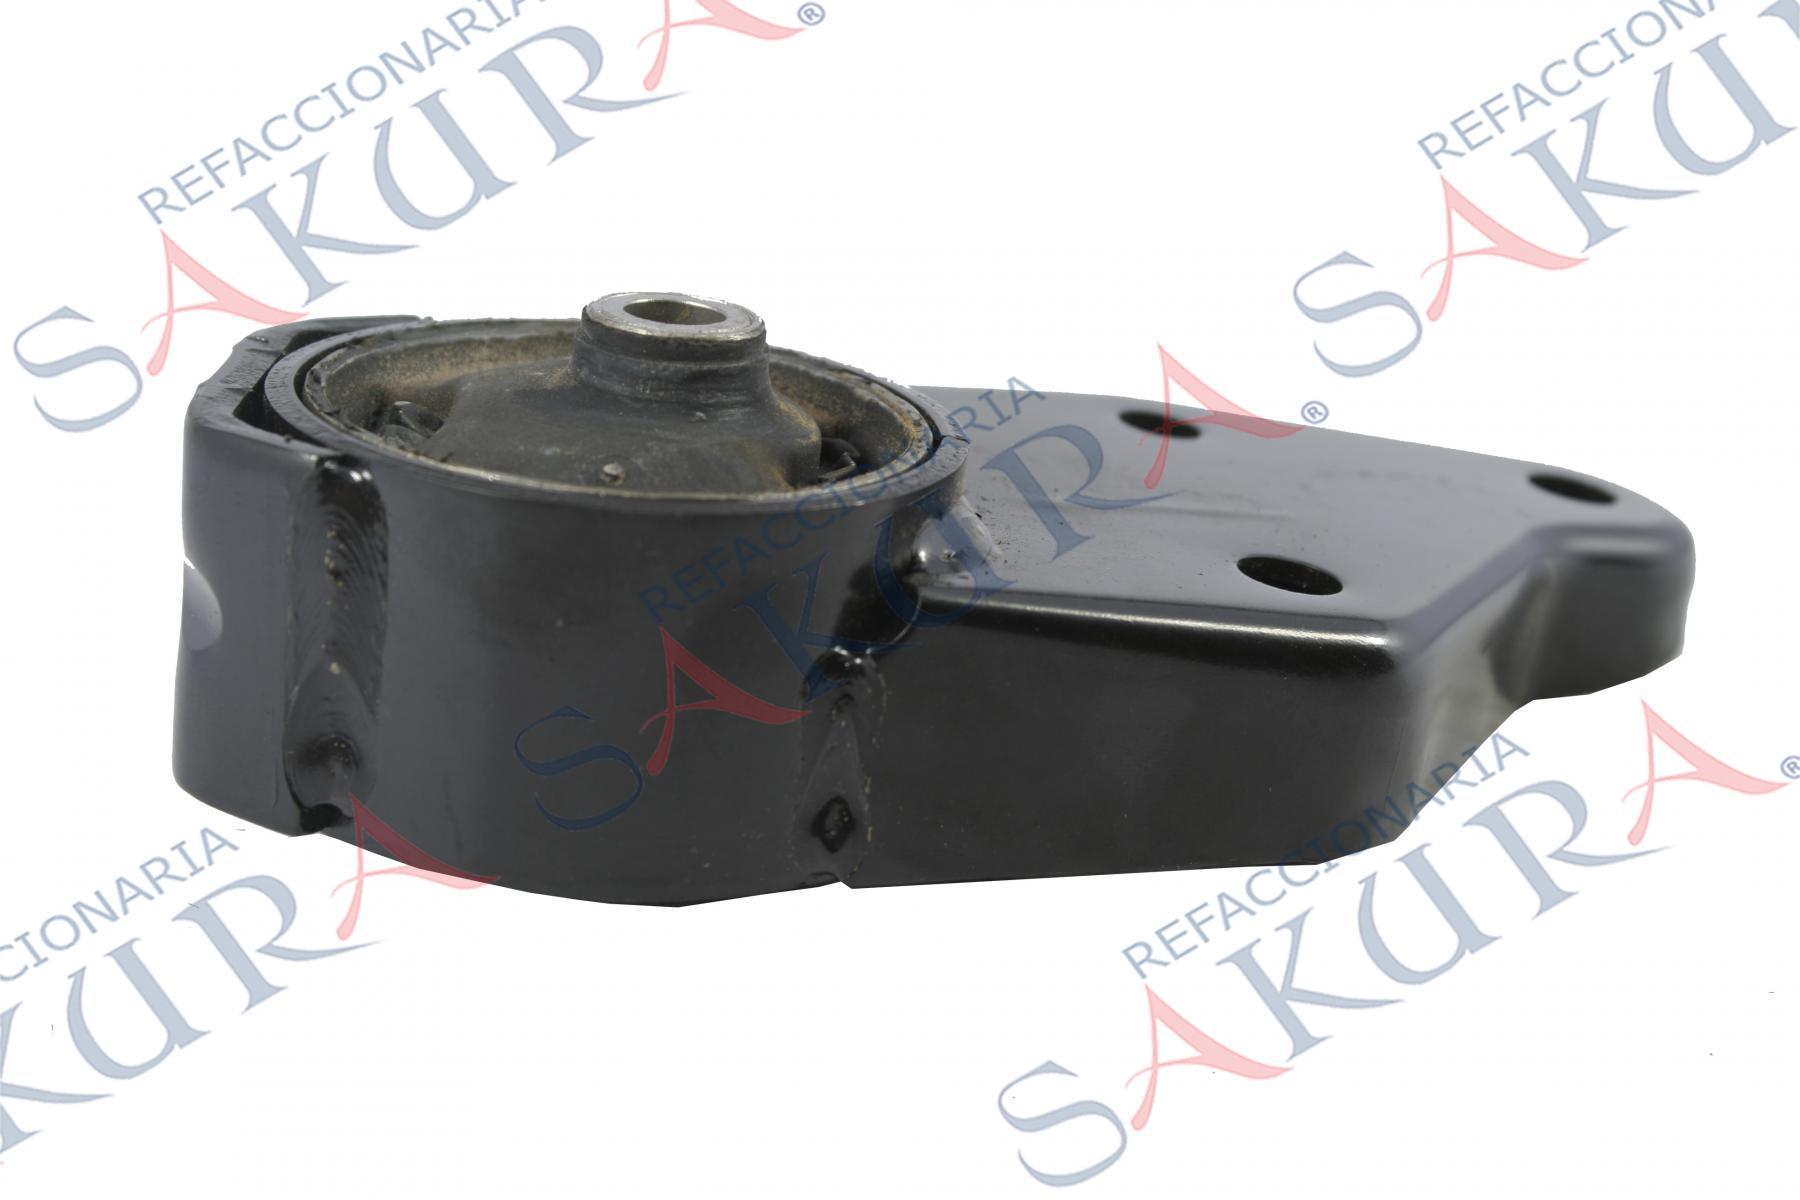 112207B000, Soporte Caja Velocidades  (Nissan)